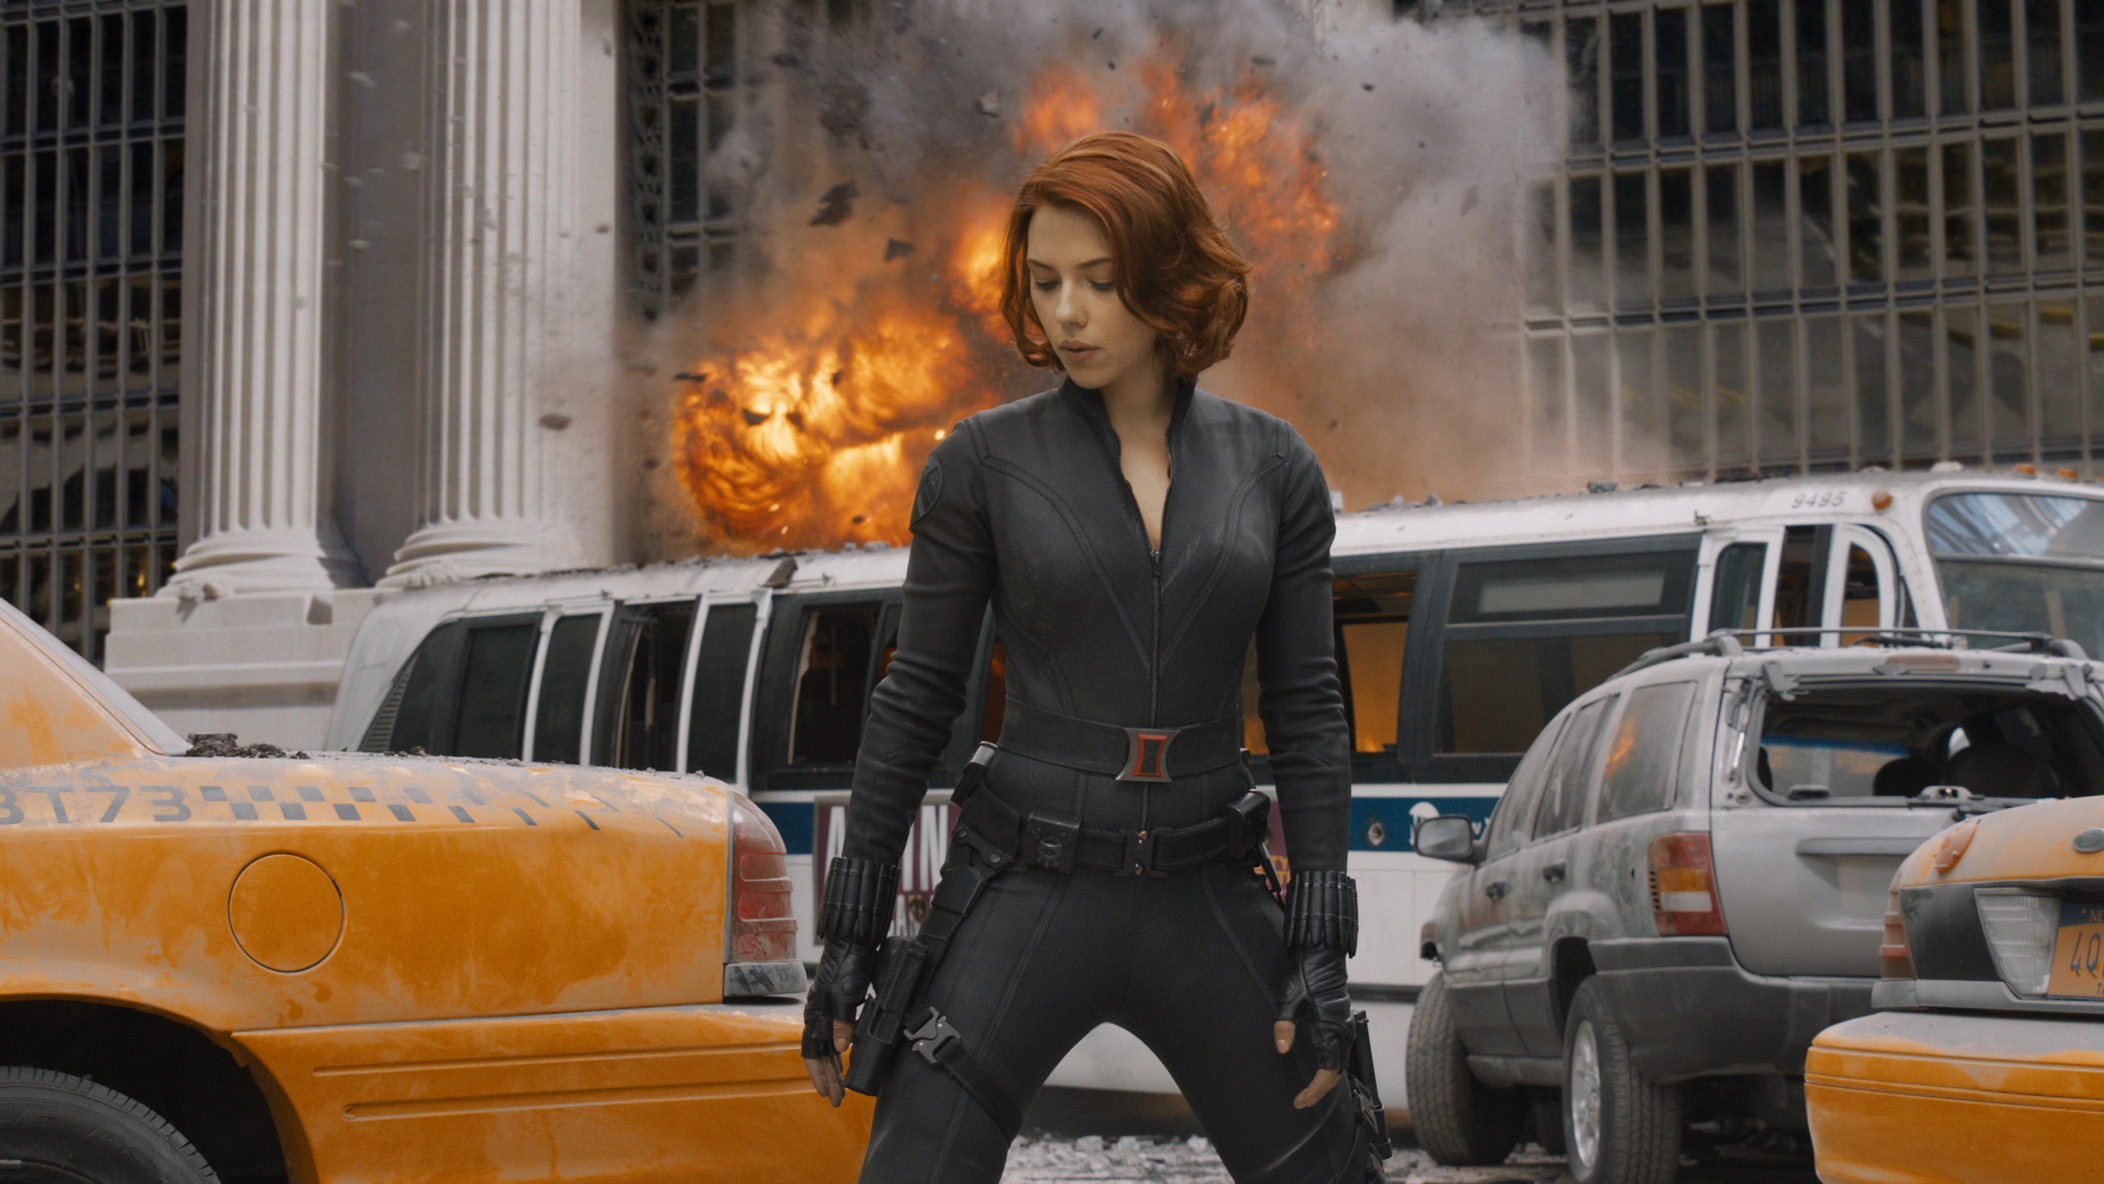 BLACK WIDOW (Scarlett Johansson)